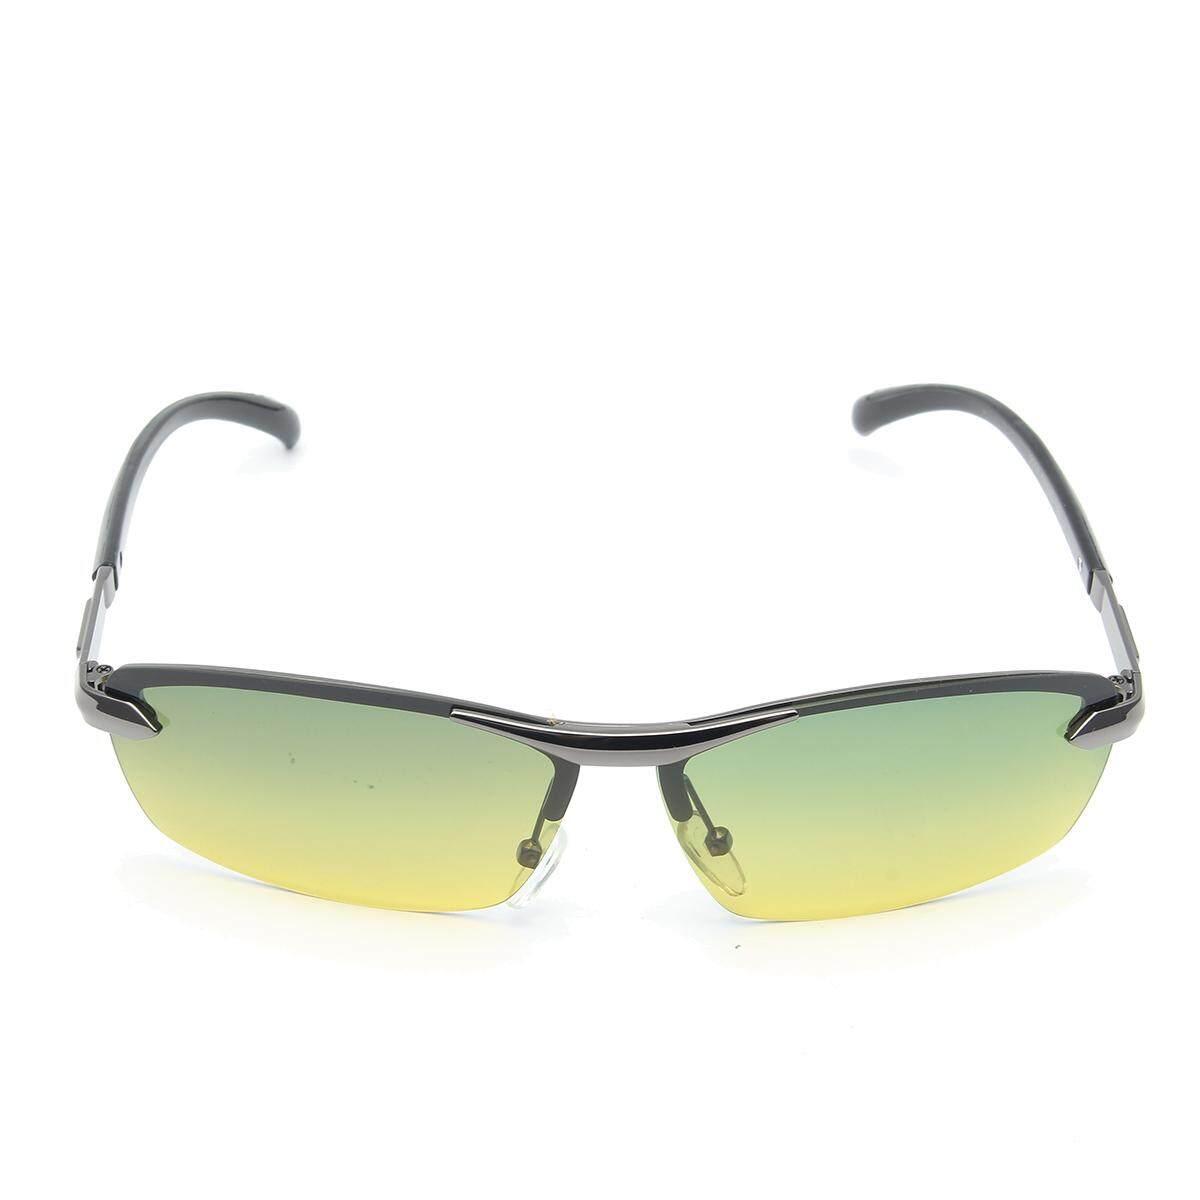 ... Hari Modus Malam Pria Kacamata Hitam Terpolarisasi Mengemudi Kaca Pilot Kacamata Hitam-Intl - 5